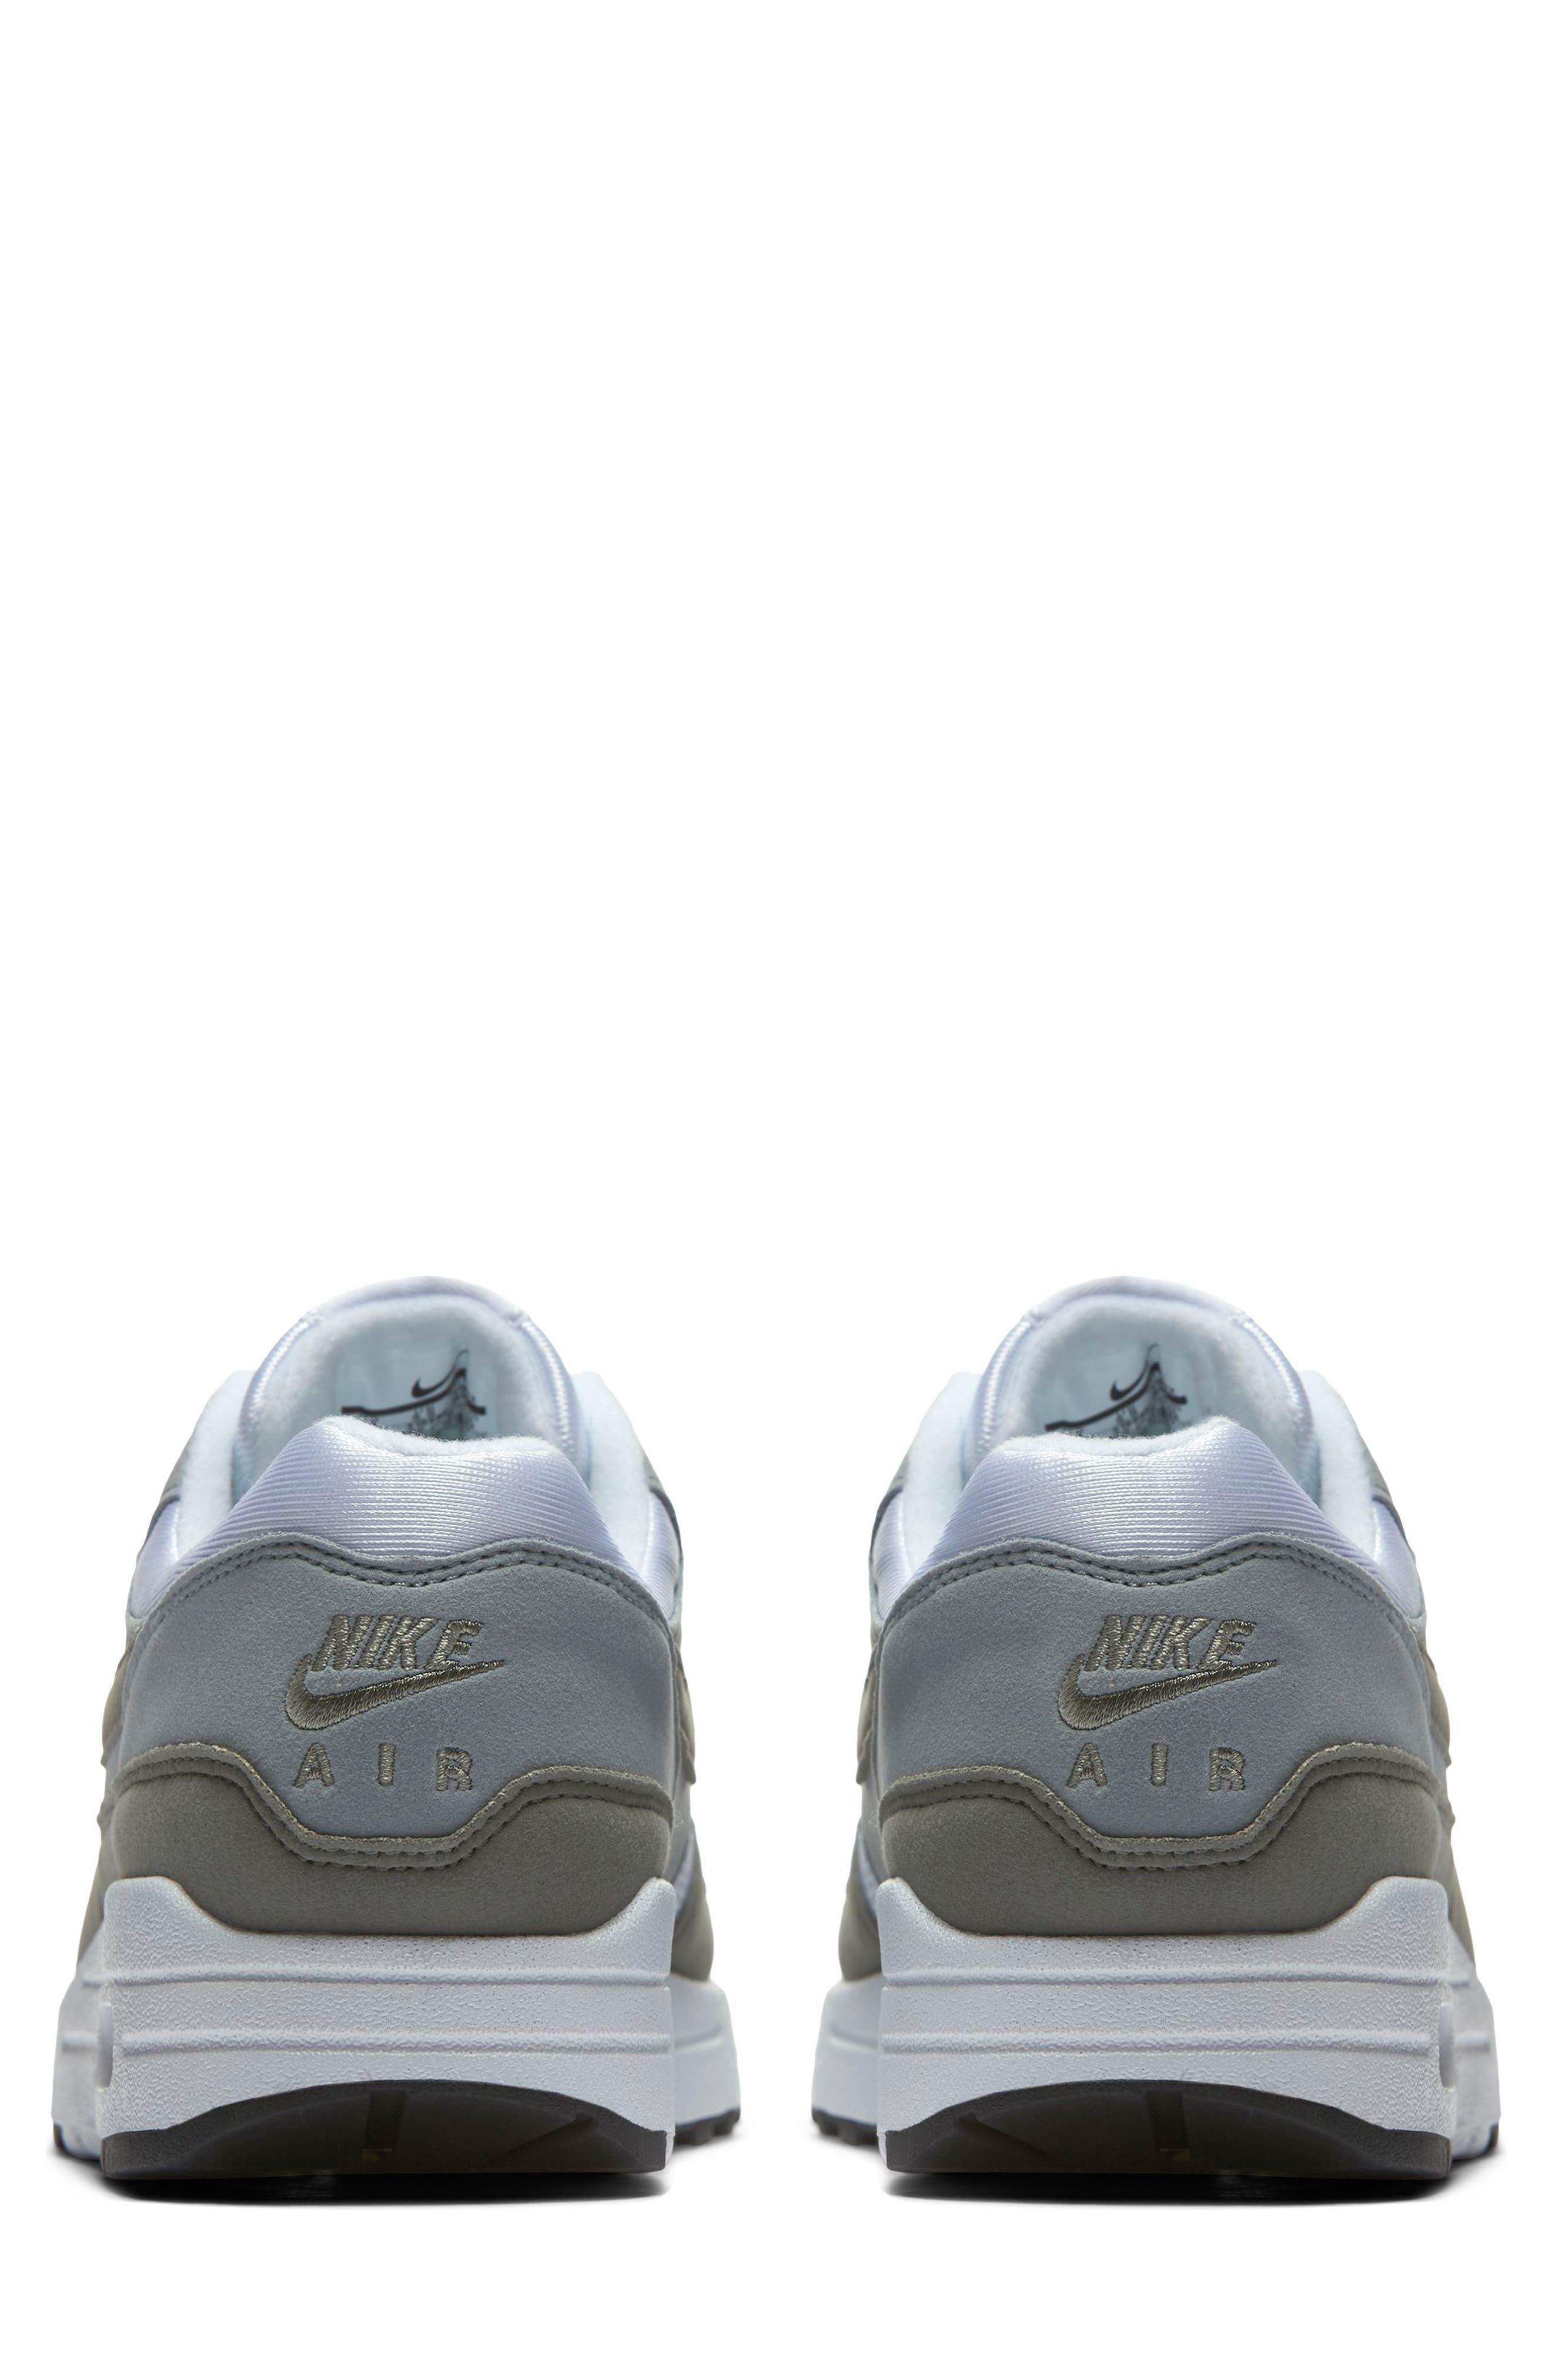 Air Max 1 Sneaker,                             Alternate thumbnail 2, color,                             White/ Dark Stucco